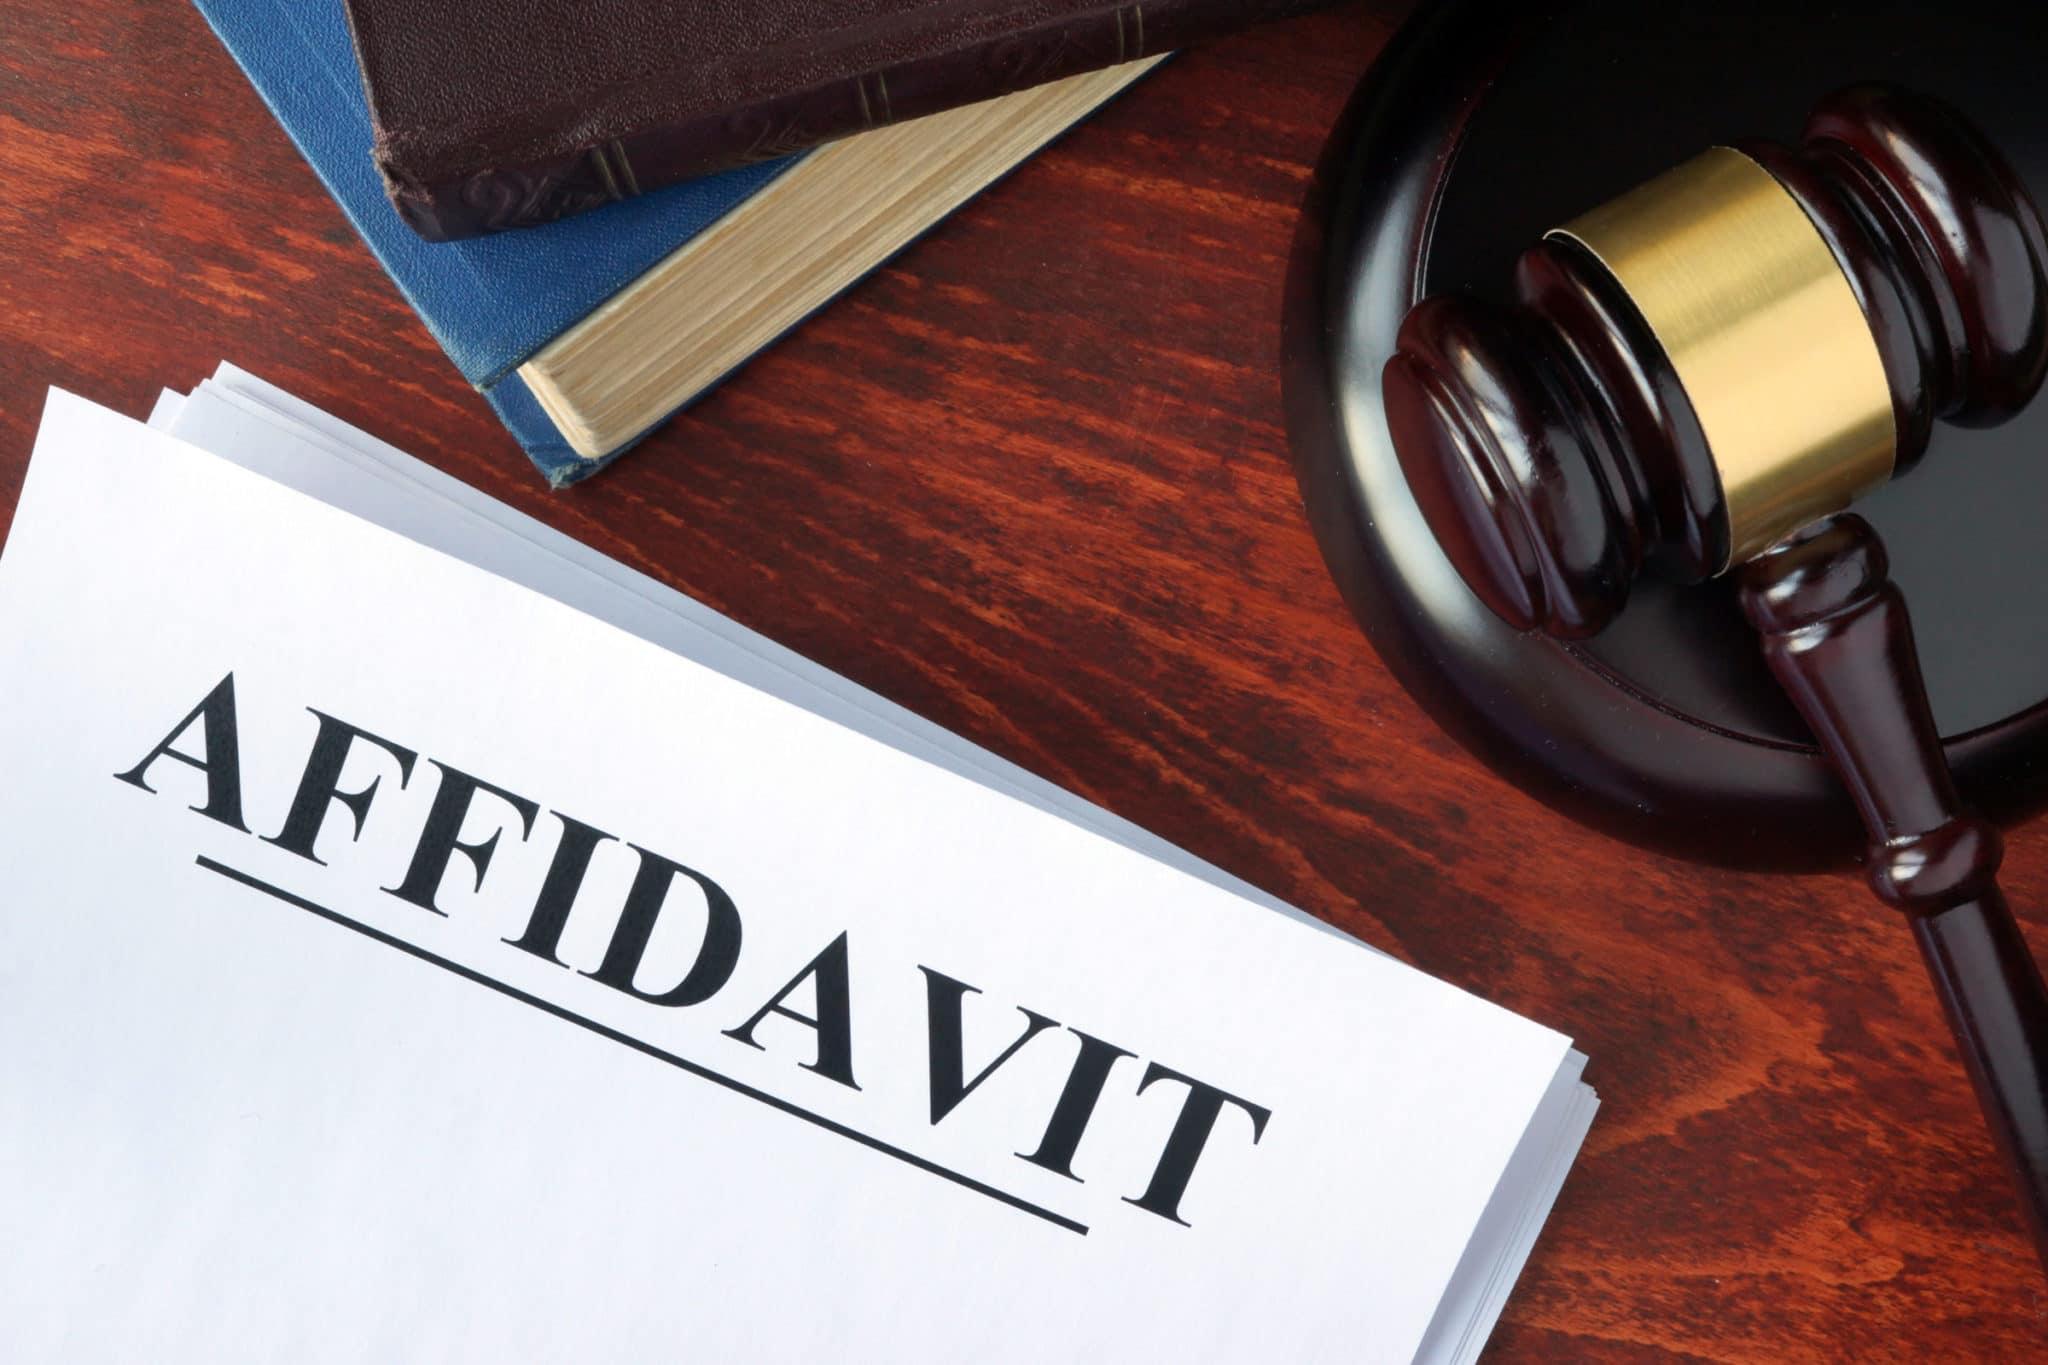 Affidavits: Commissioning Or Notarizing Them In Calgary, Alberta